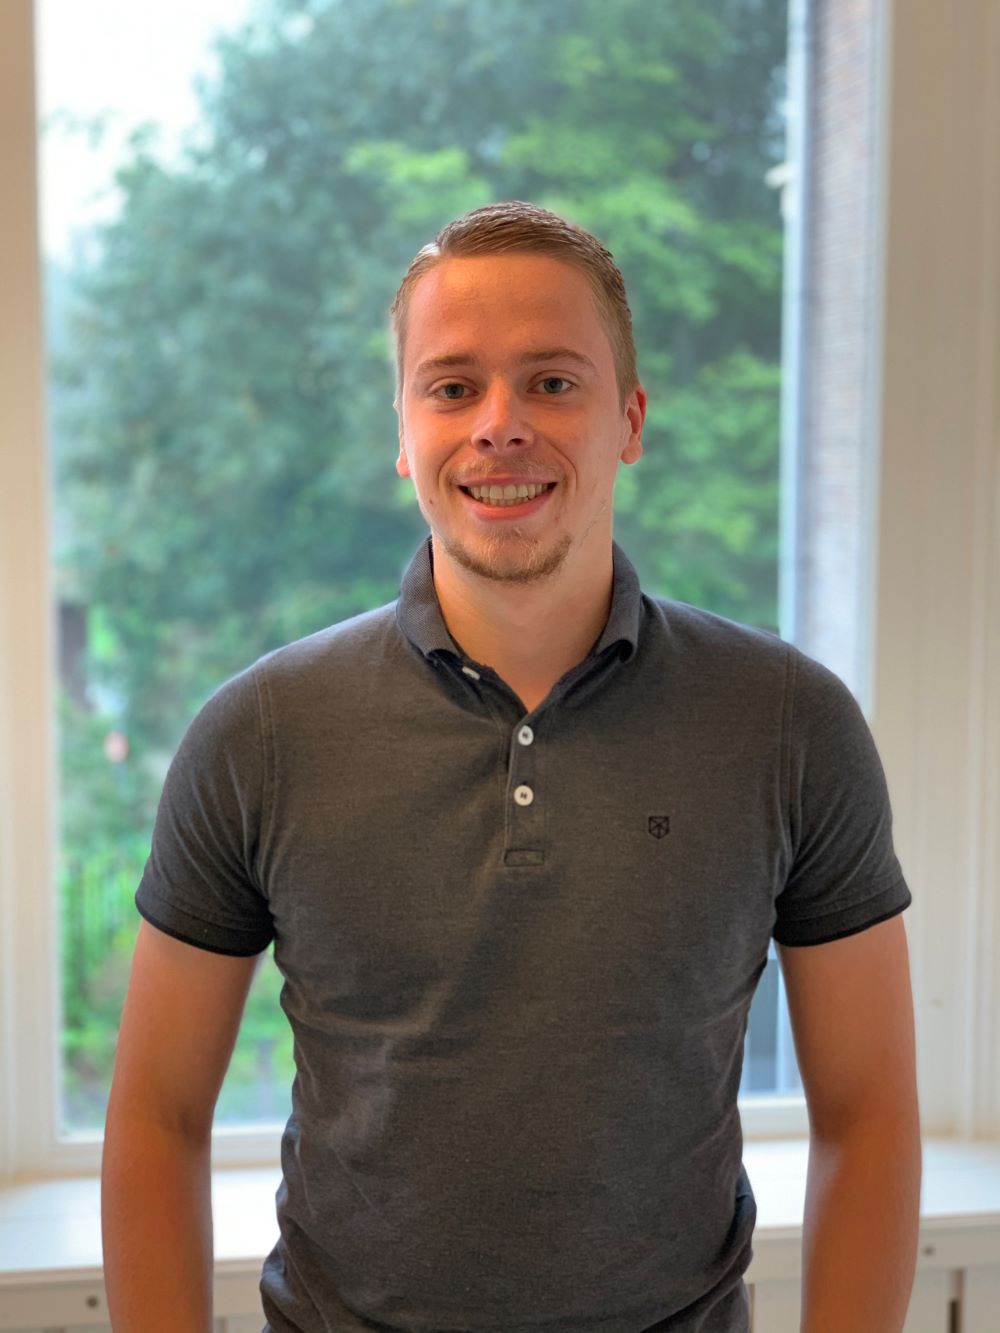 Ruben Hoogstraten